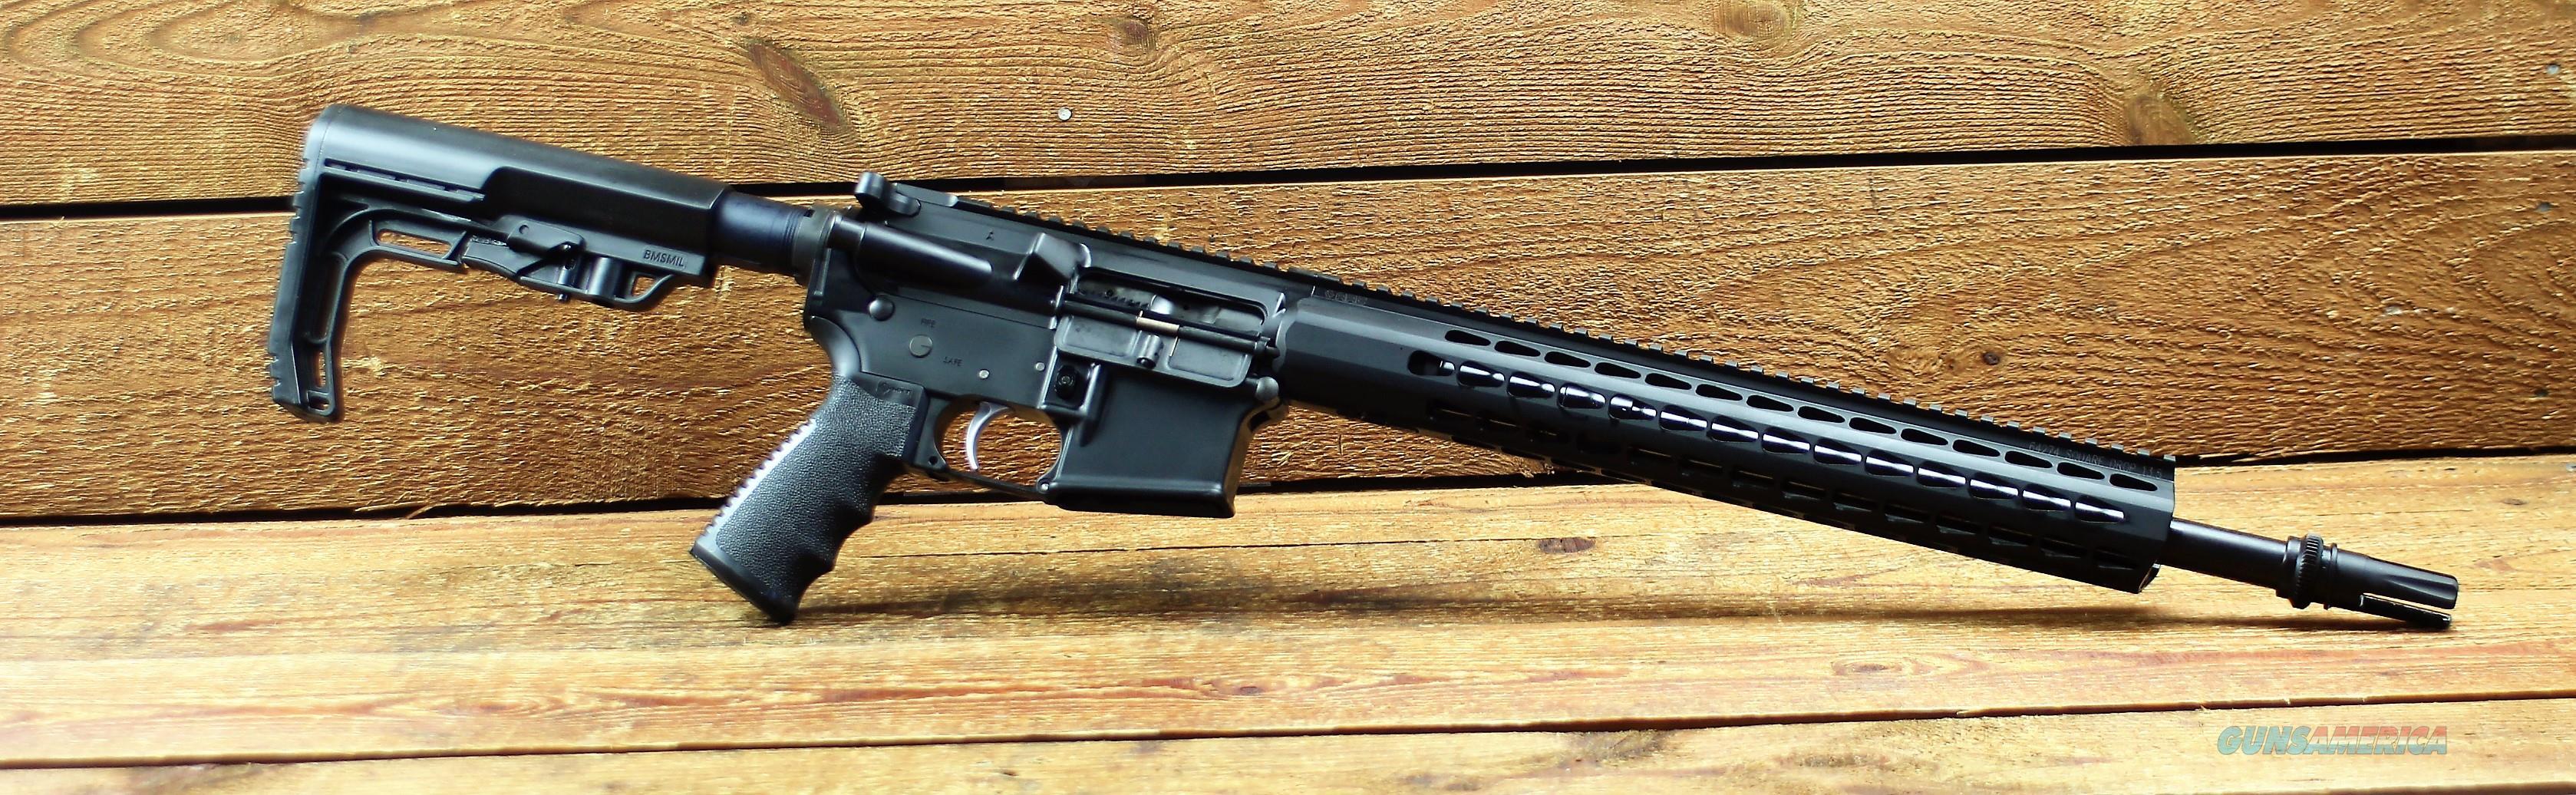 "$82 SALE EASY PAY  BUSHMASTER MINIMALIST AR15 Firepower Carbine .300 AAC BlackOut stock lightweight only 6 lbs 16"" contour Chrome Moly Steel Barrel FNC treated  AR-15 5.5lb trigger pull  AR15 Twist Rate: 1:7  Mil-Spec 90924  Guns > Rifles > Bushmaster Rifles > Complete Rifles"